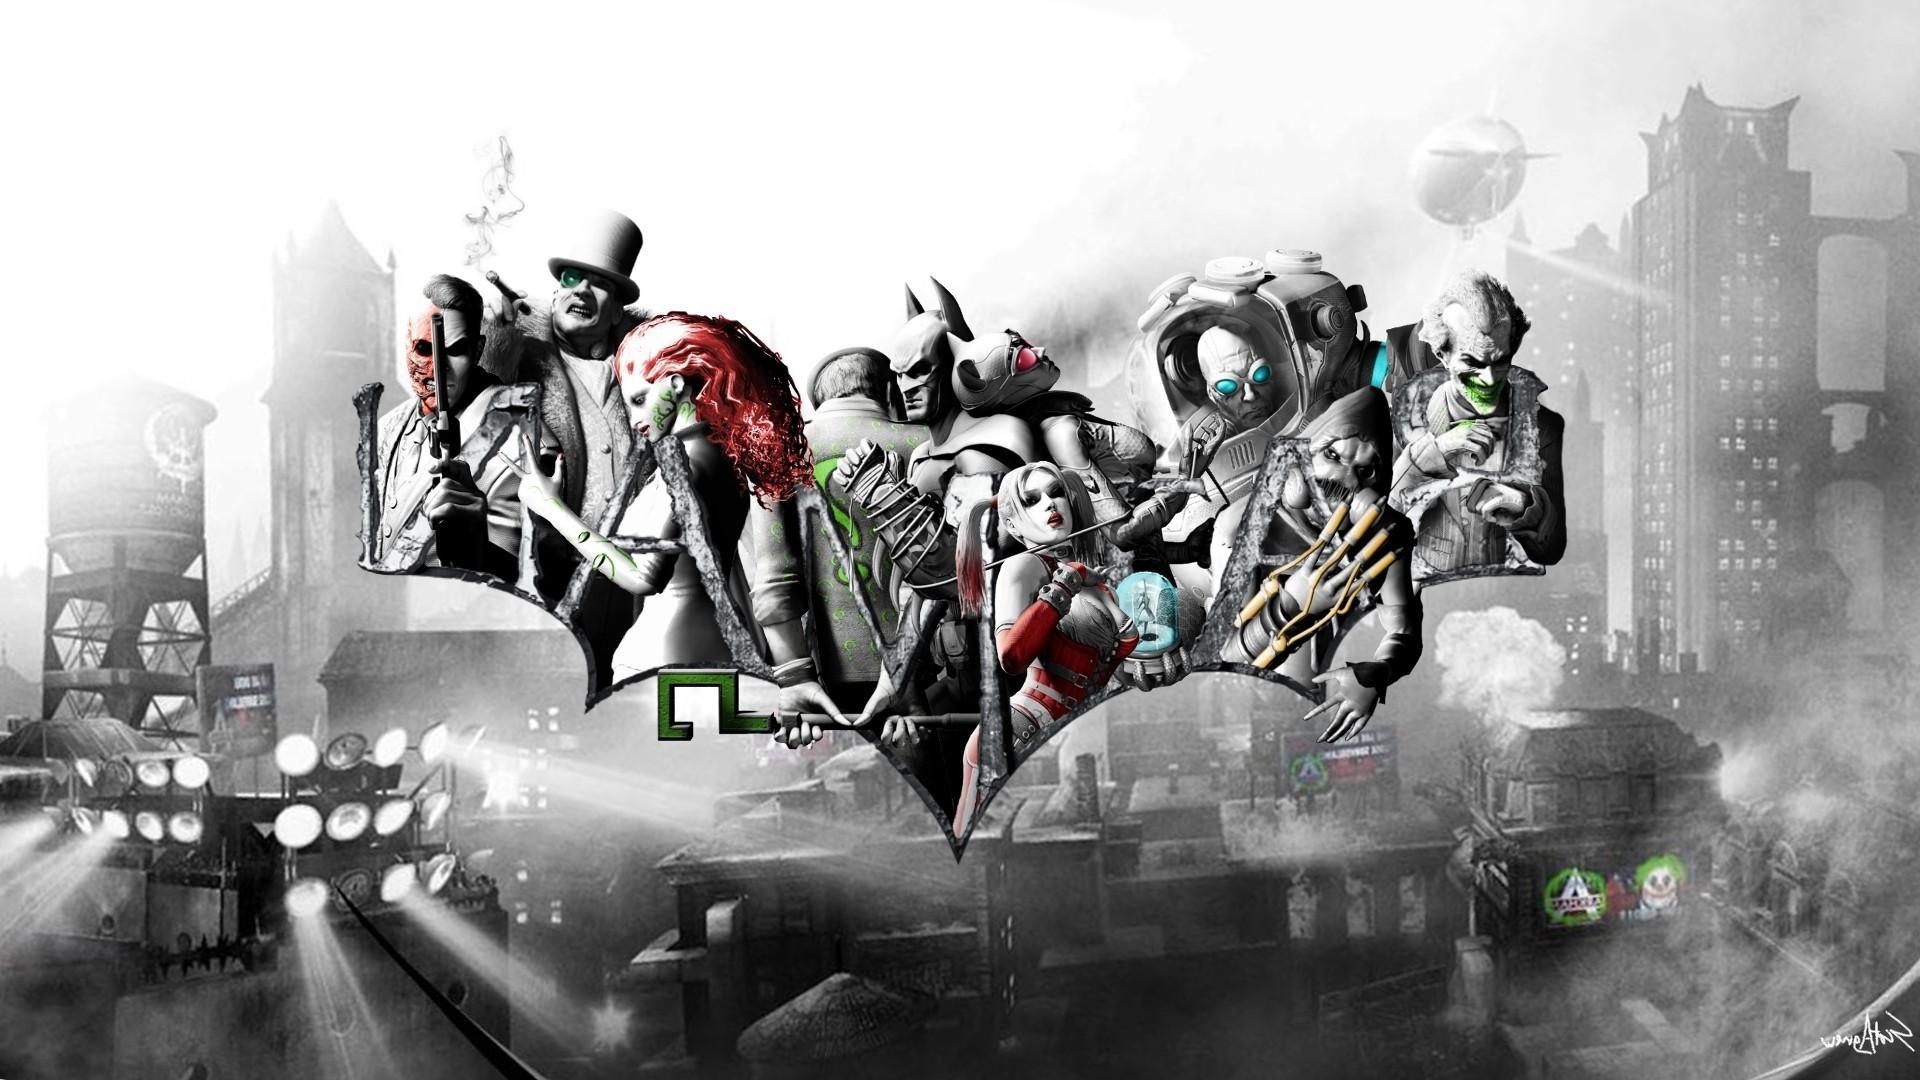 … Mr Freeze, Joker, Scarecrow (character), Catwoman, The Riddler, Harley  Quinn, Batman: Arkham City Wallpapers HD / Desktop and Mobile Backgrounds